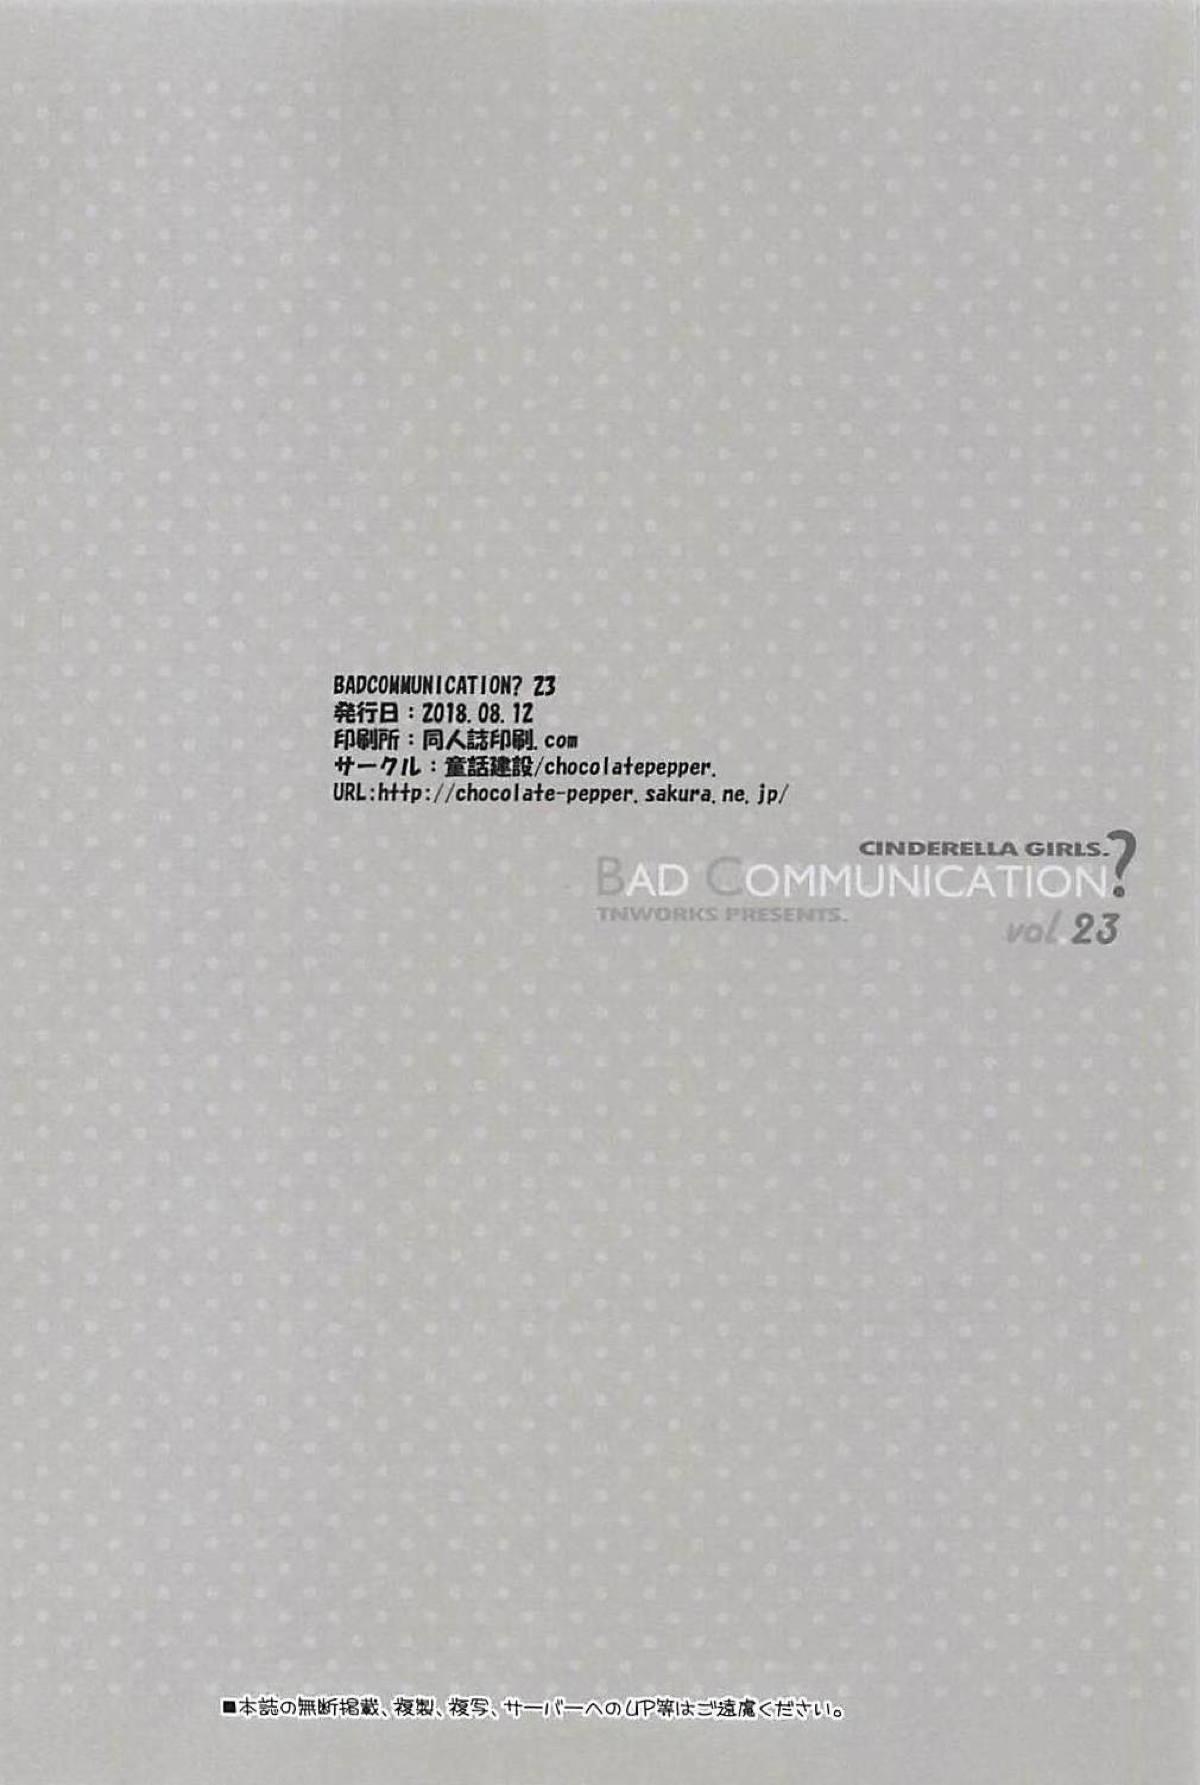 BAD COMMUNICATION? vol. 23 25